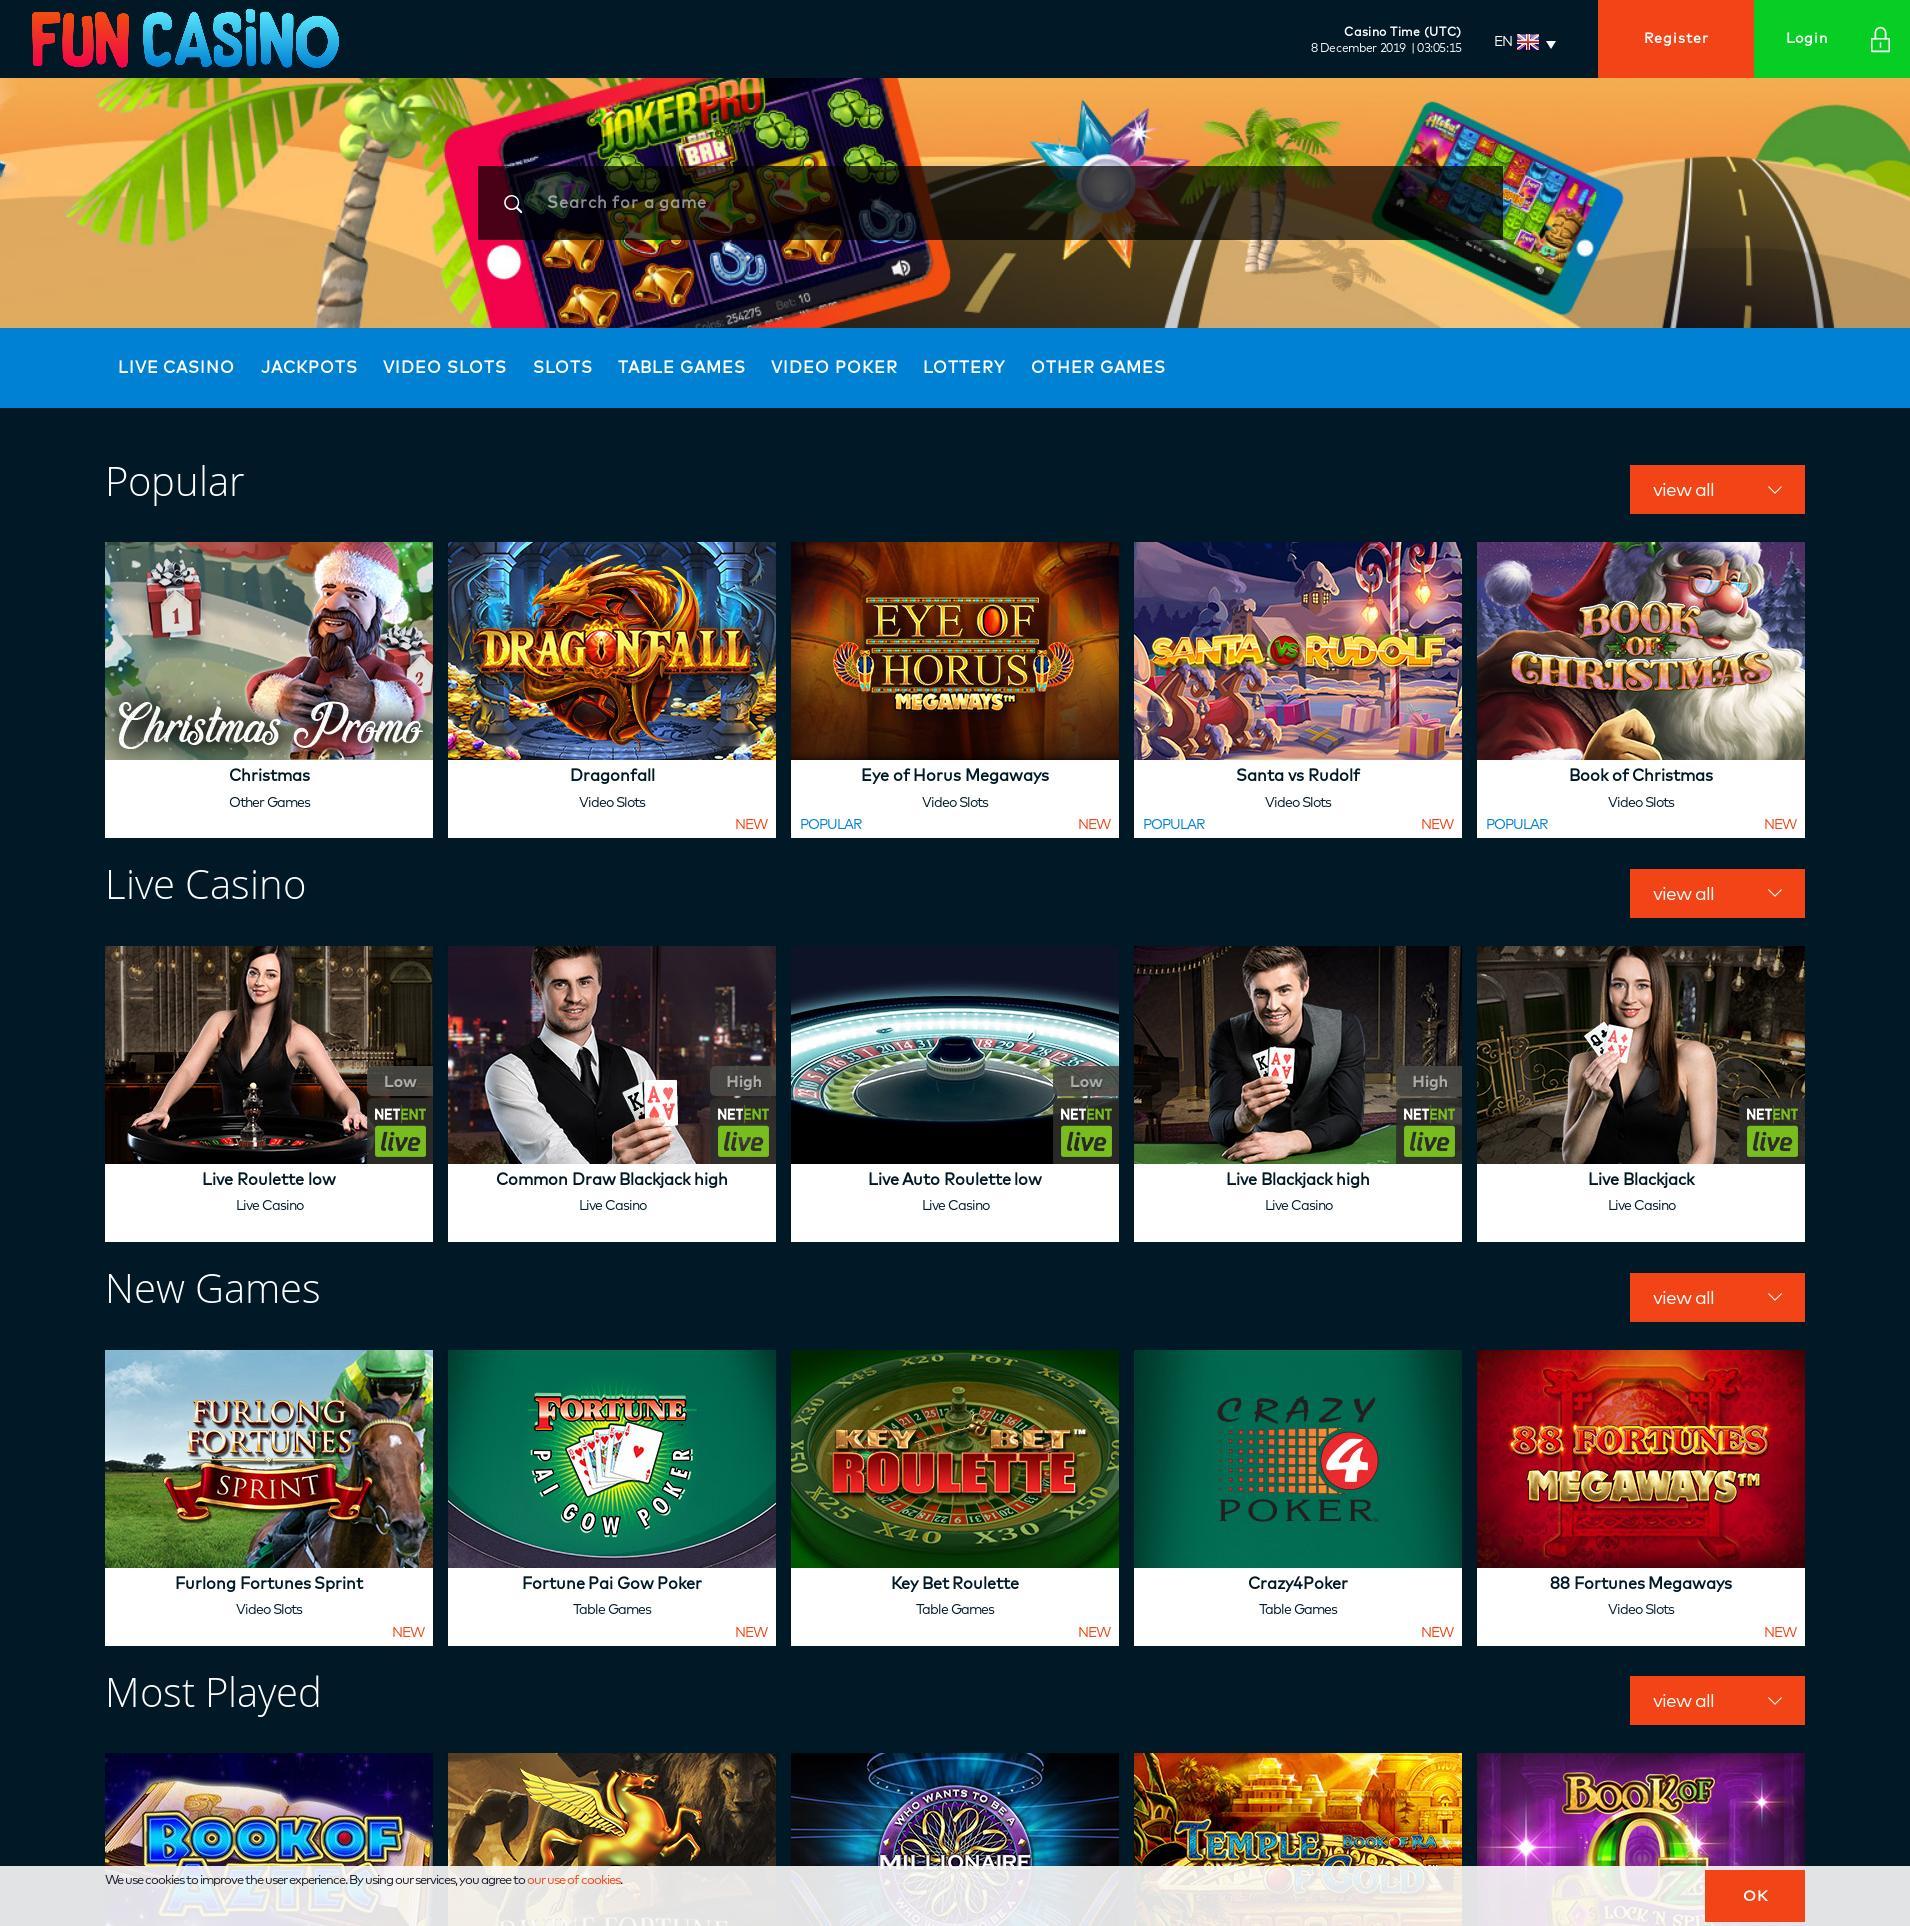 Casino screen Lobby 2019-12-08 for United Kingdom